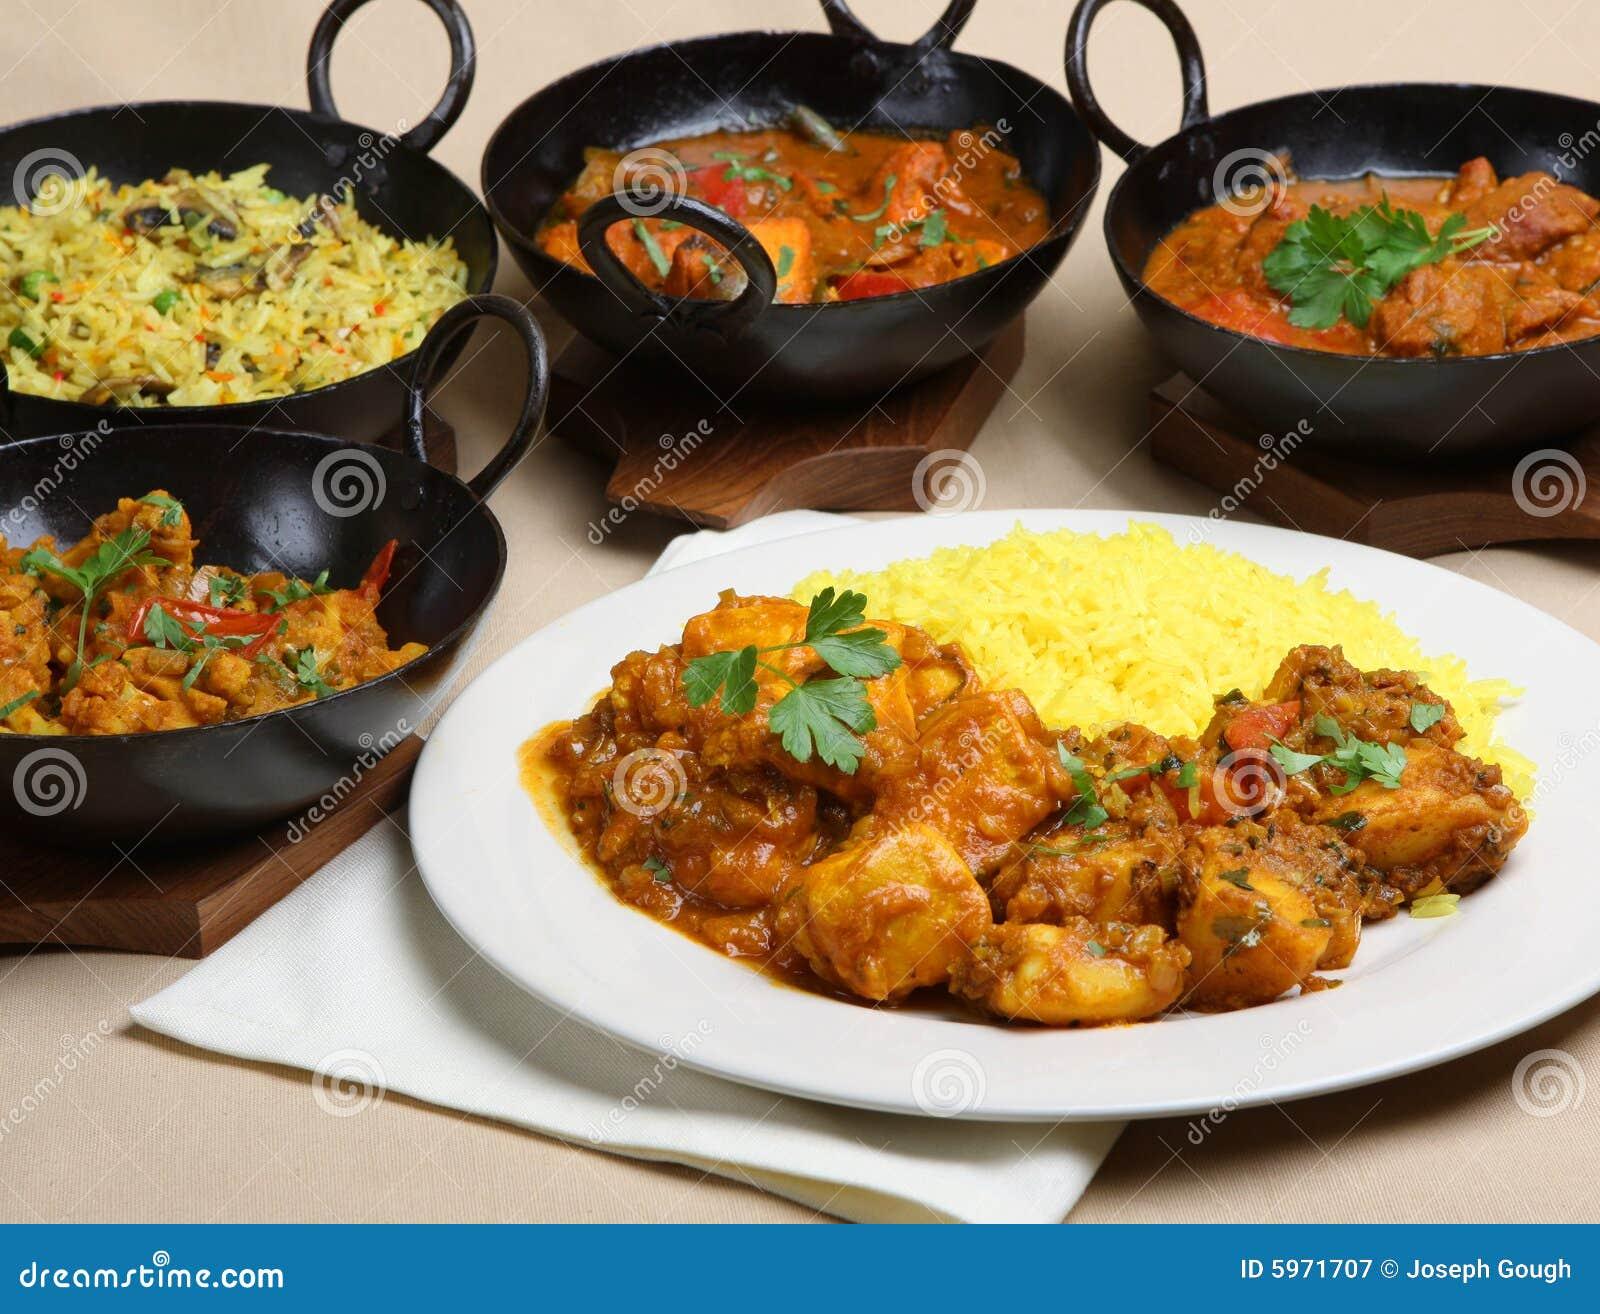 Nourriture indienne de repas de cari